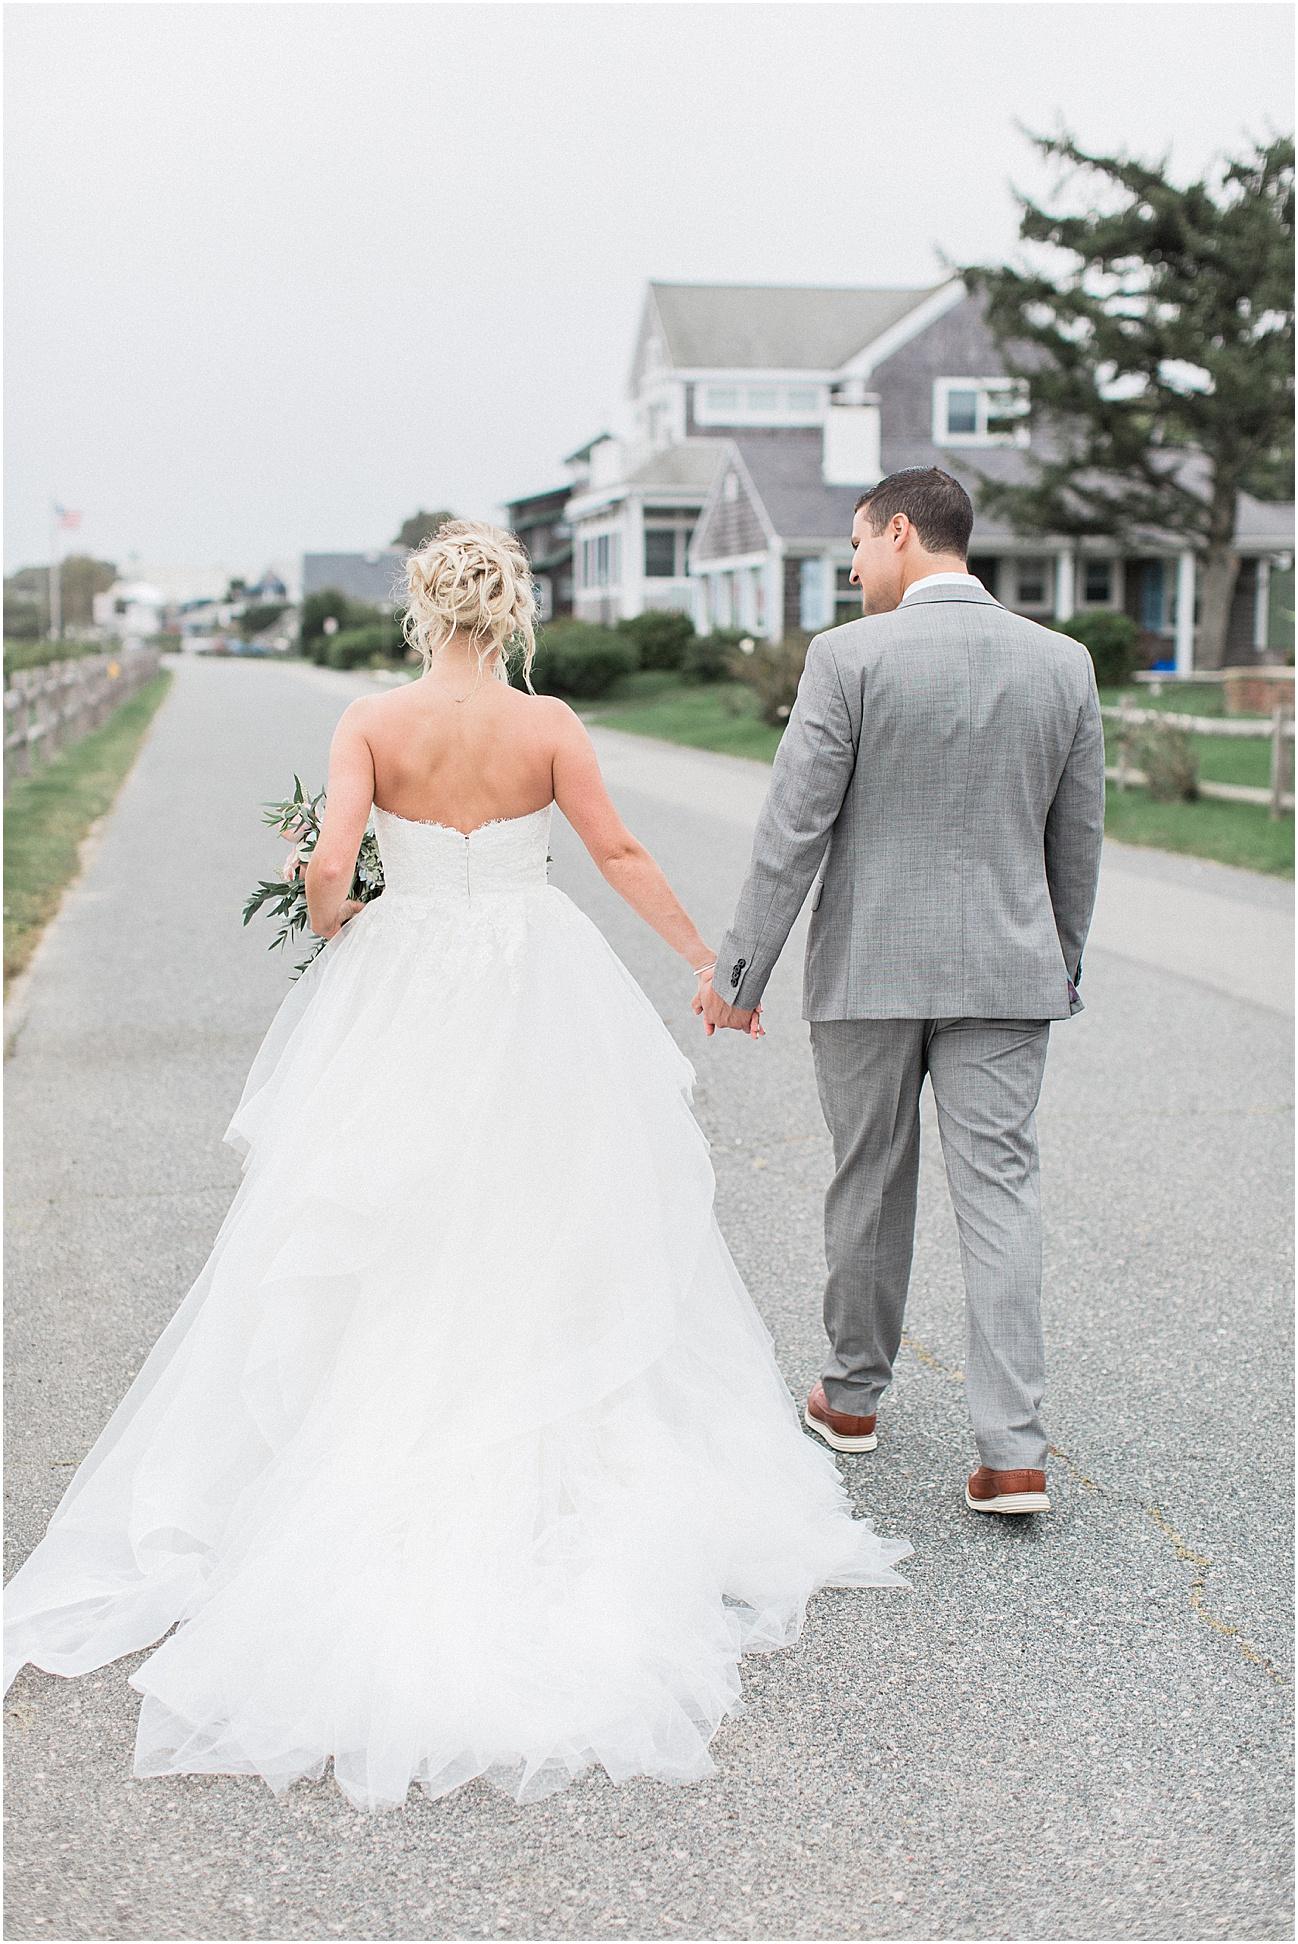 deanna_tyler_popponesset_inn_nautical_dusty_rose_pink_blue_french_fall_gray_bridesmaid_cape_cod_boston_wedding_photographer_meredith_jane_photography_photo_1353.jpg